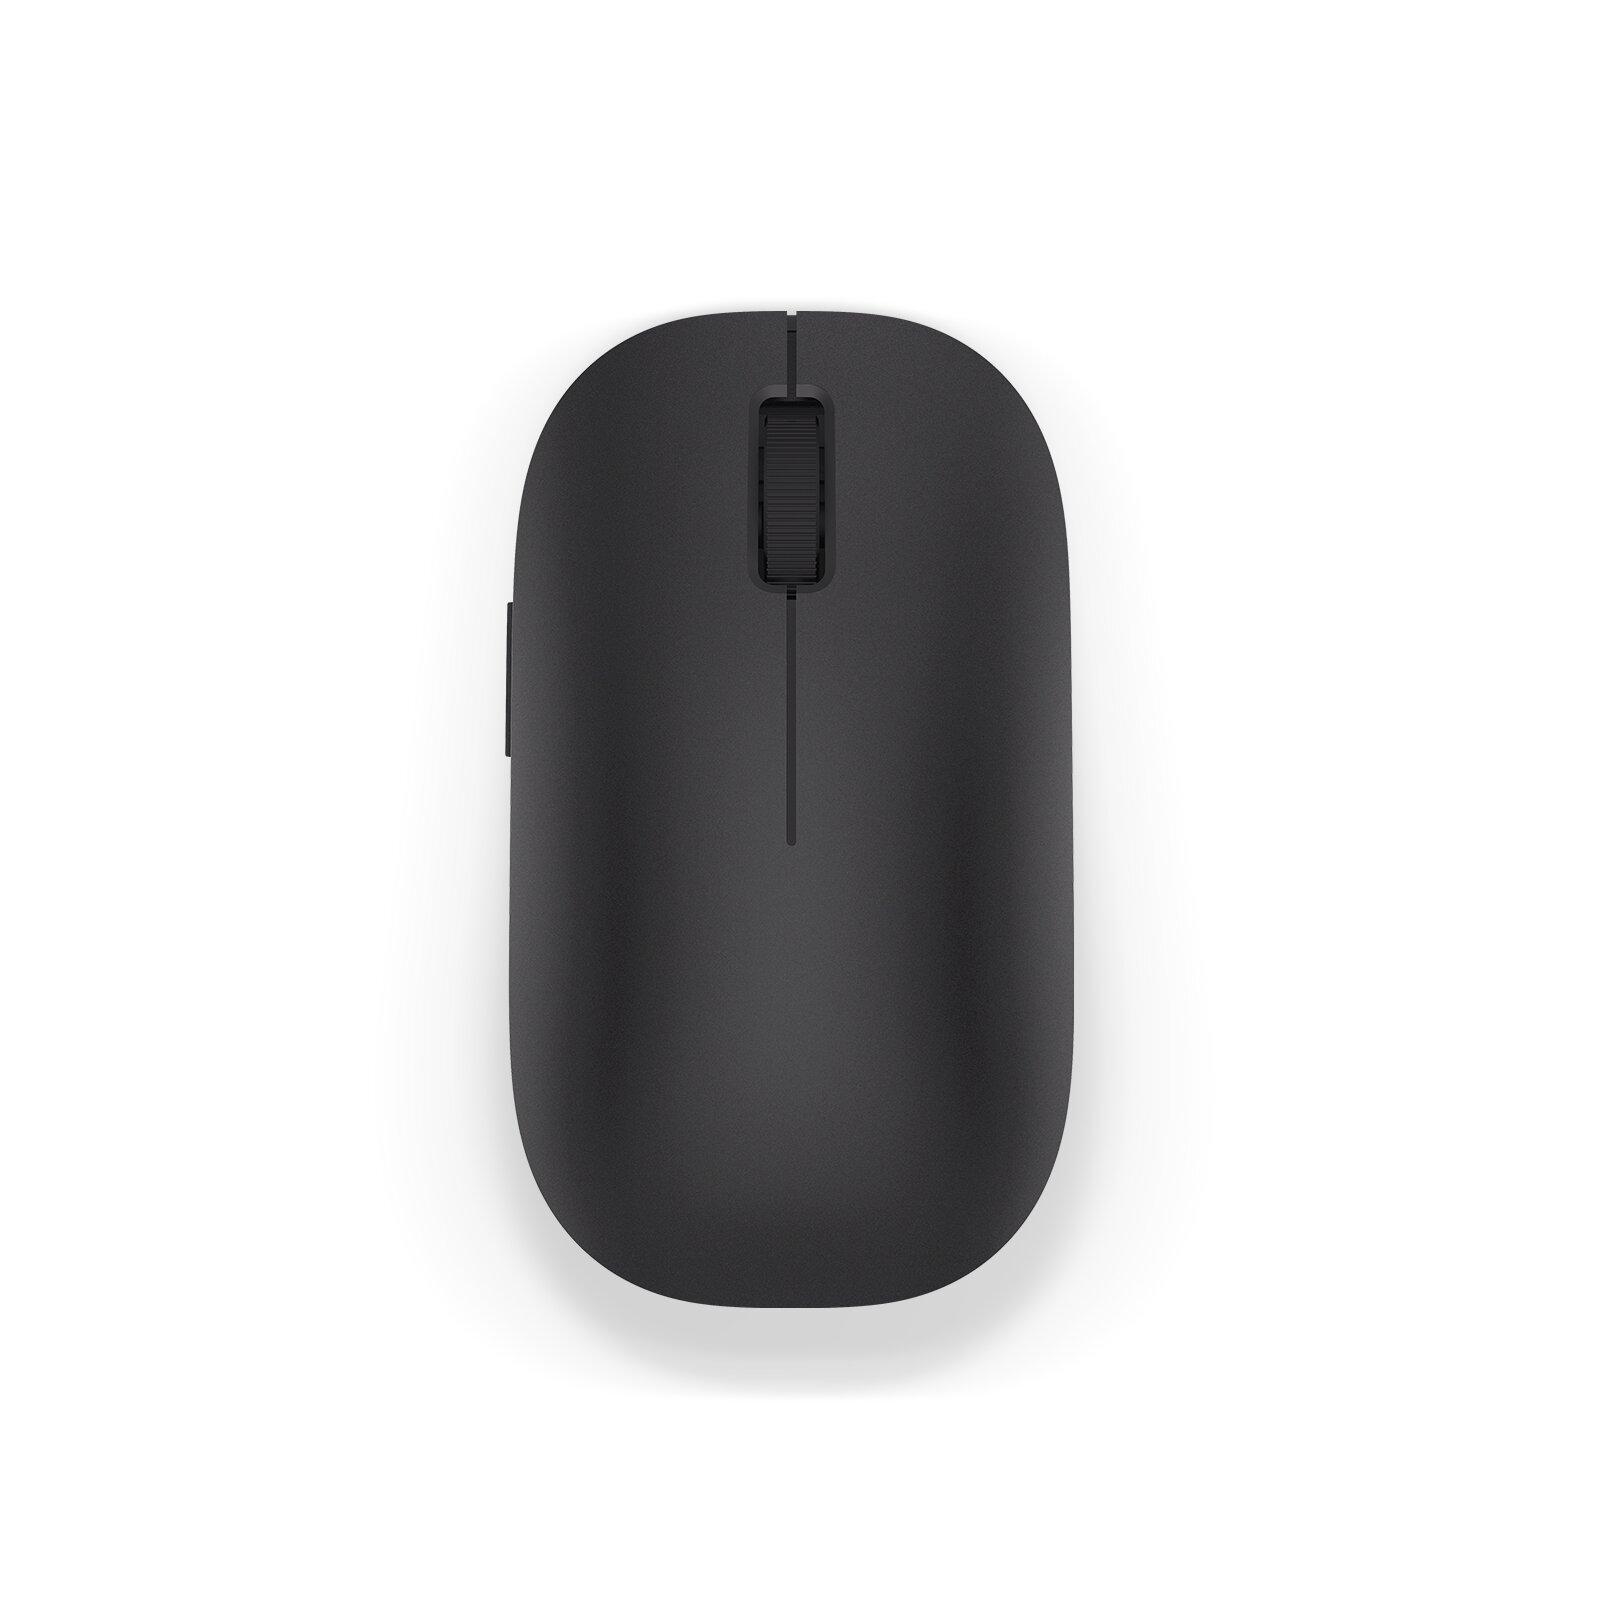 Original Xiaomi 1200 DPI 2.4Ghz Wireless Mouse Optical Mini Portable Mouse For Windows 8 Win10